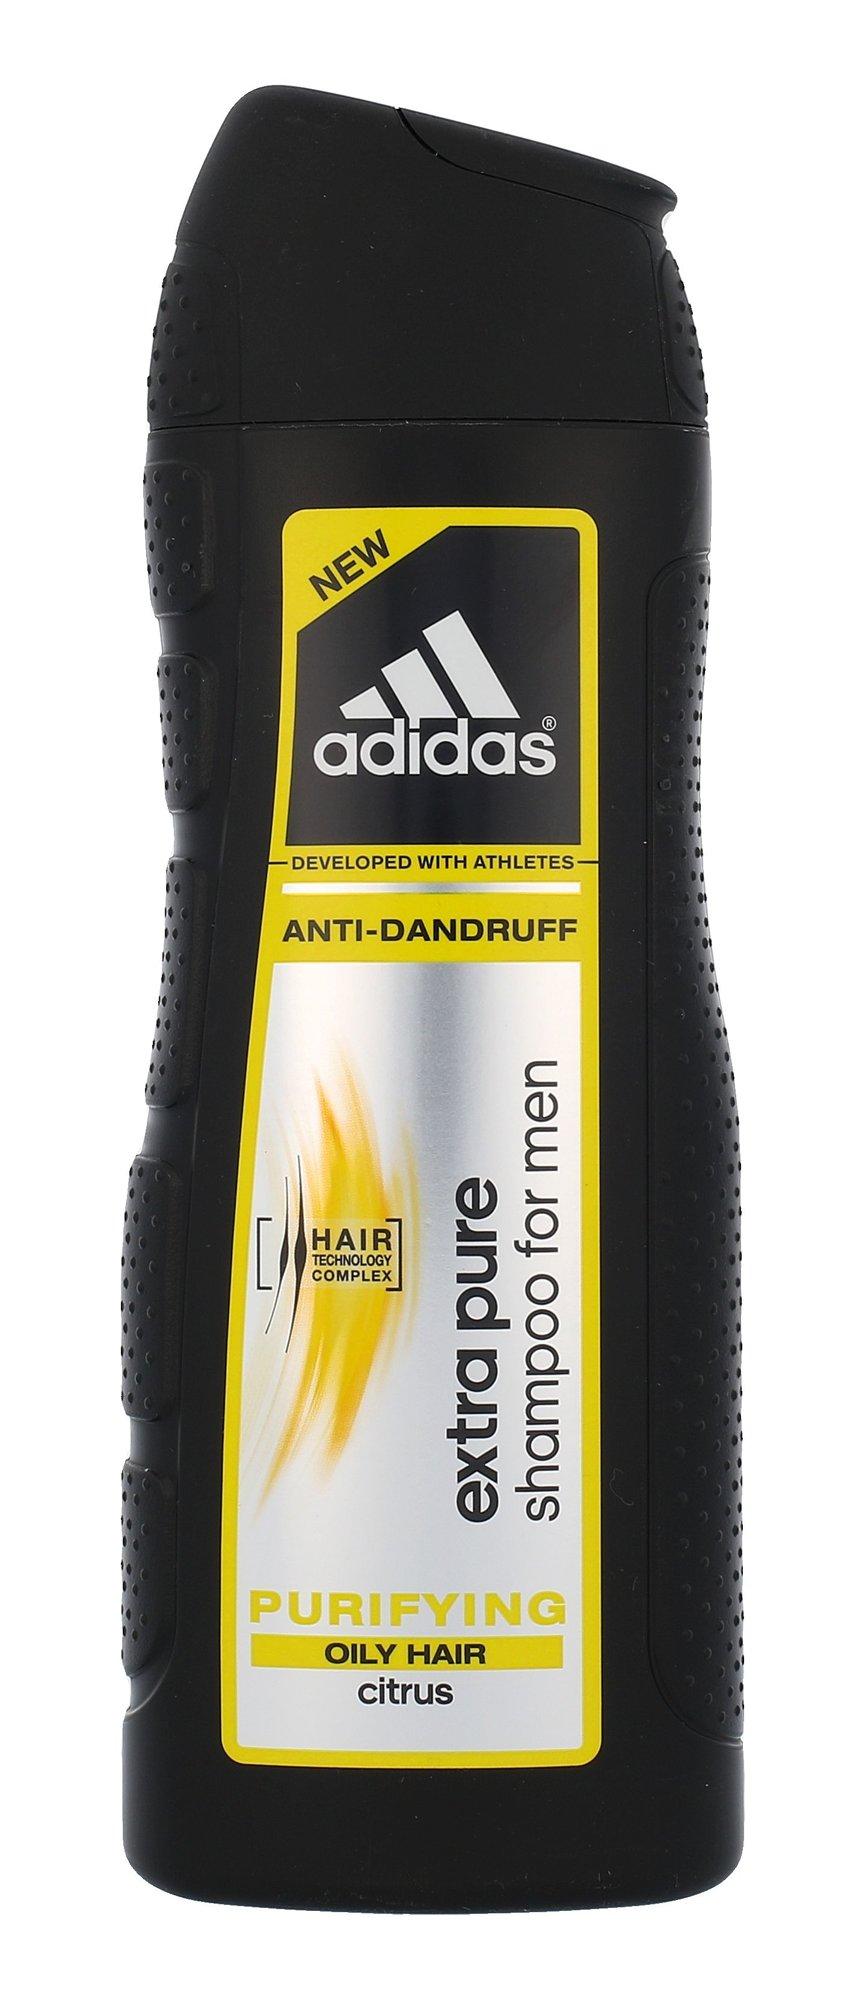 Adidas Extra Pure Shampoo 400ml